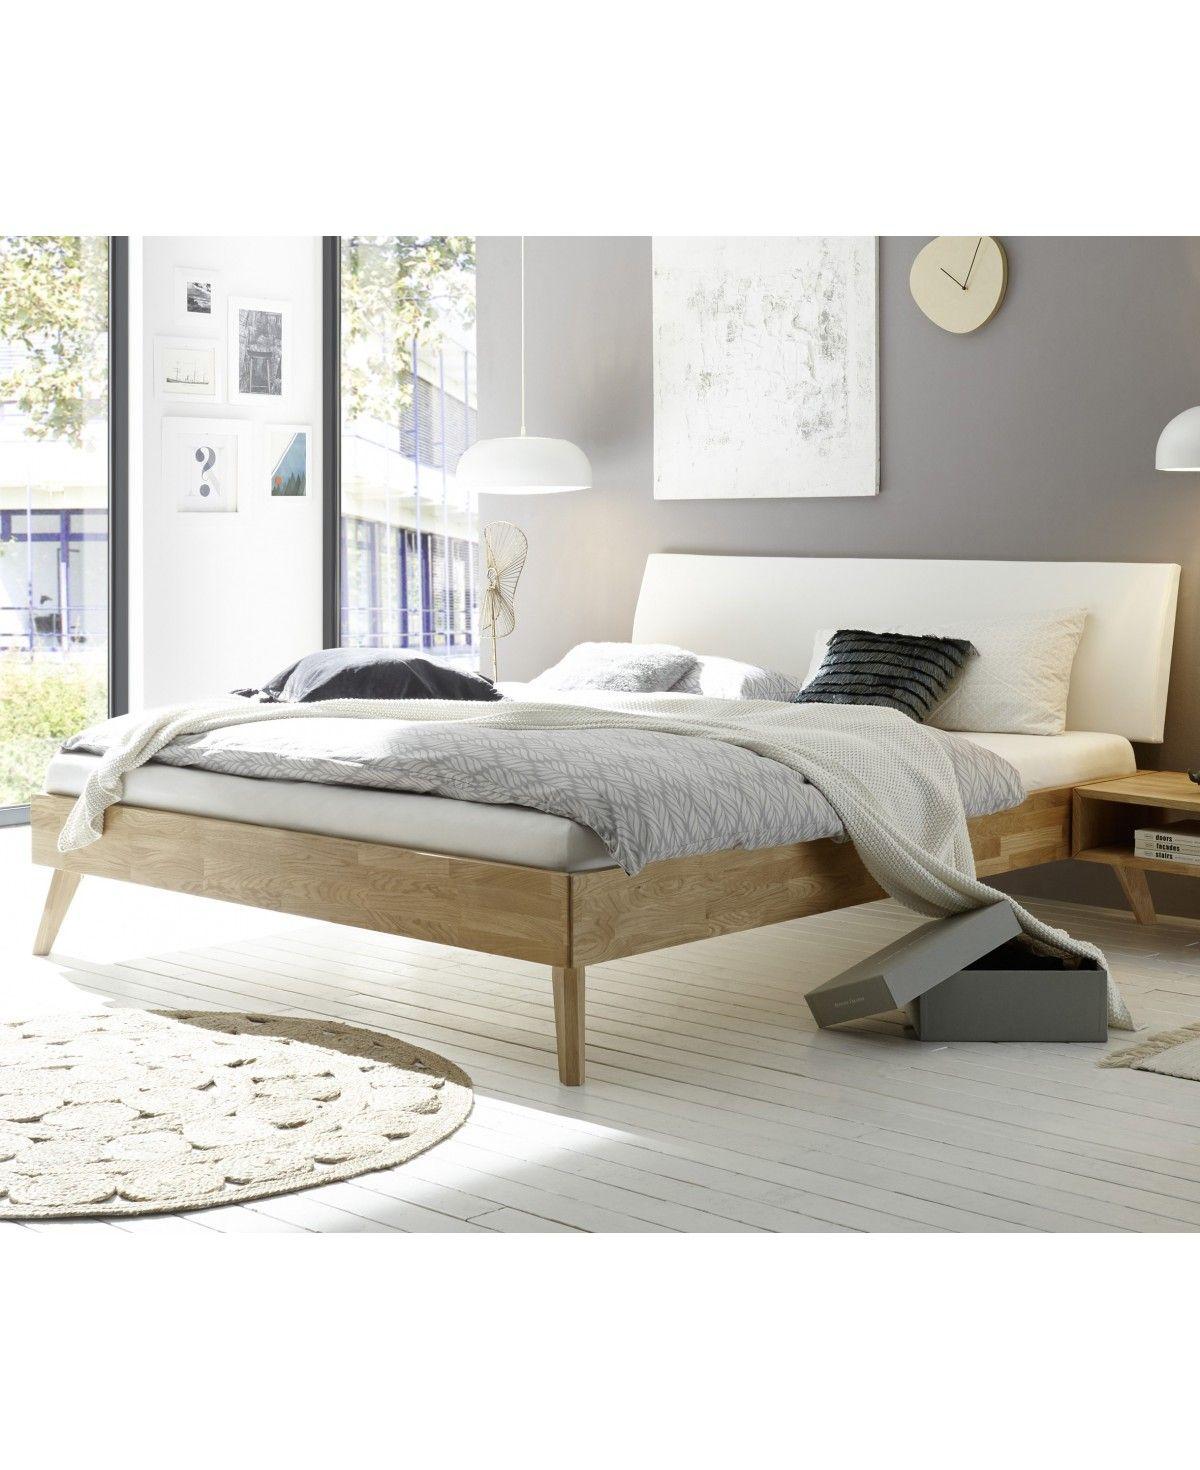 hasena fine line moderno eiche bett pesaro kopfteil lecco. Black Bedroom Furniture Sets. Home Design Ideas